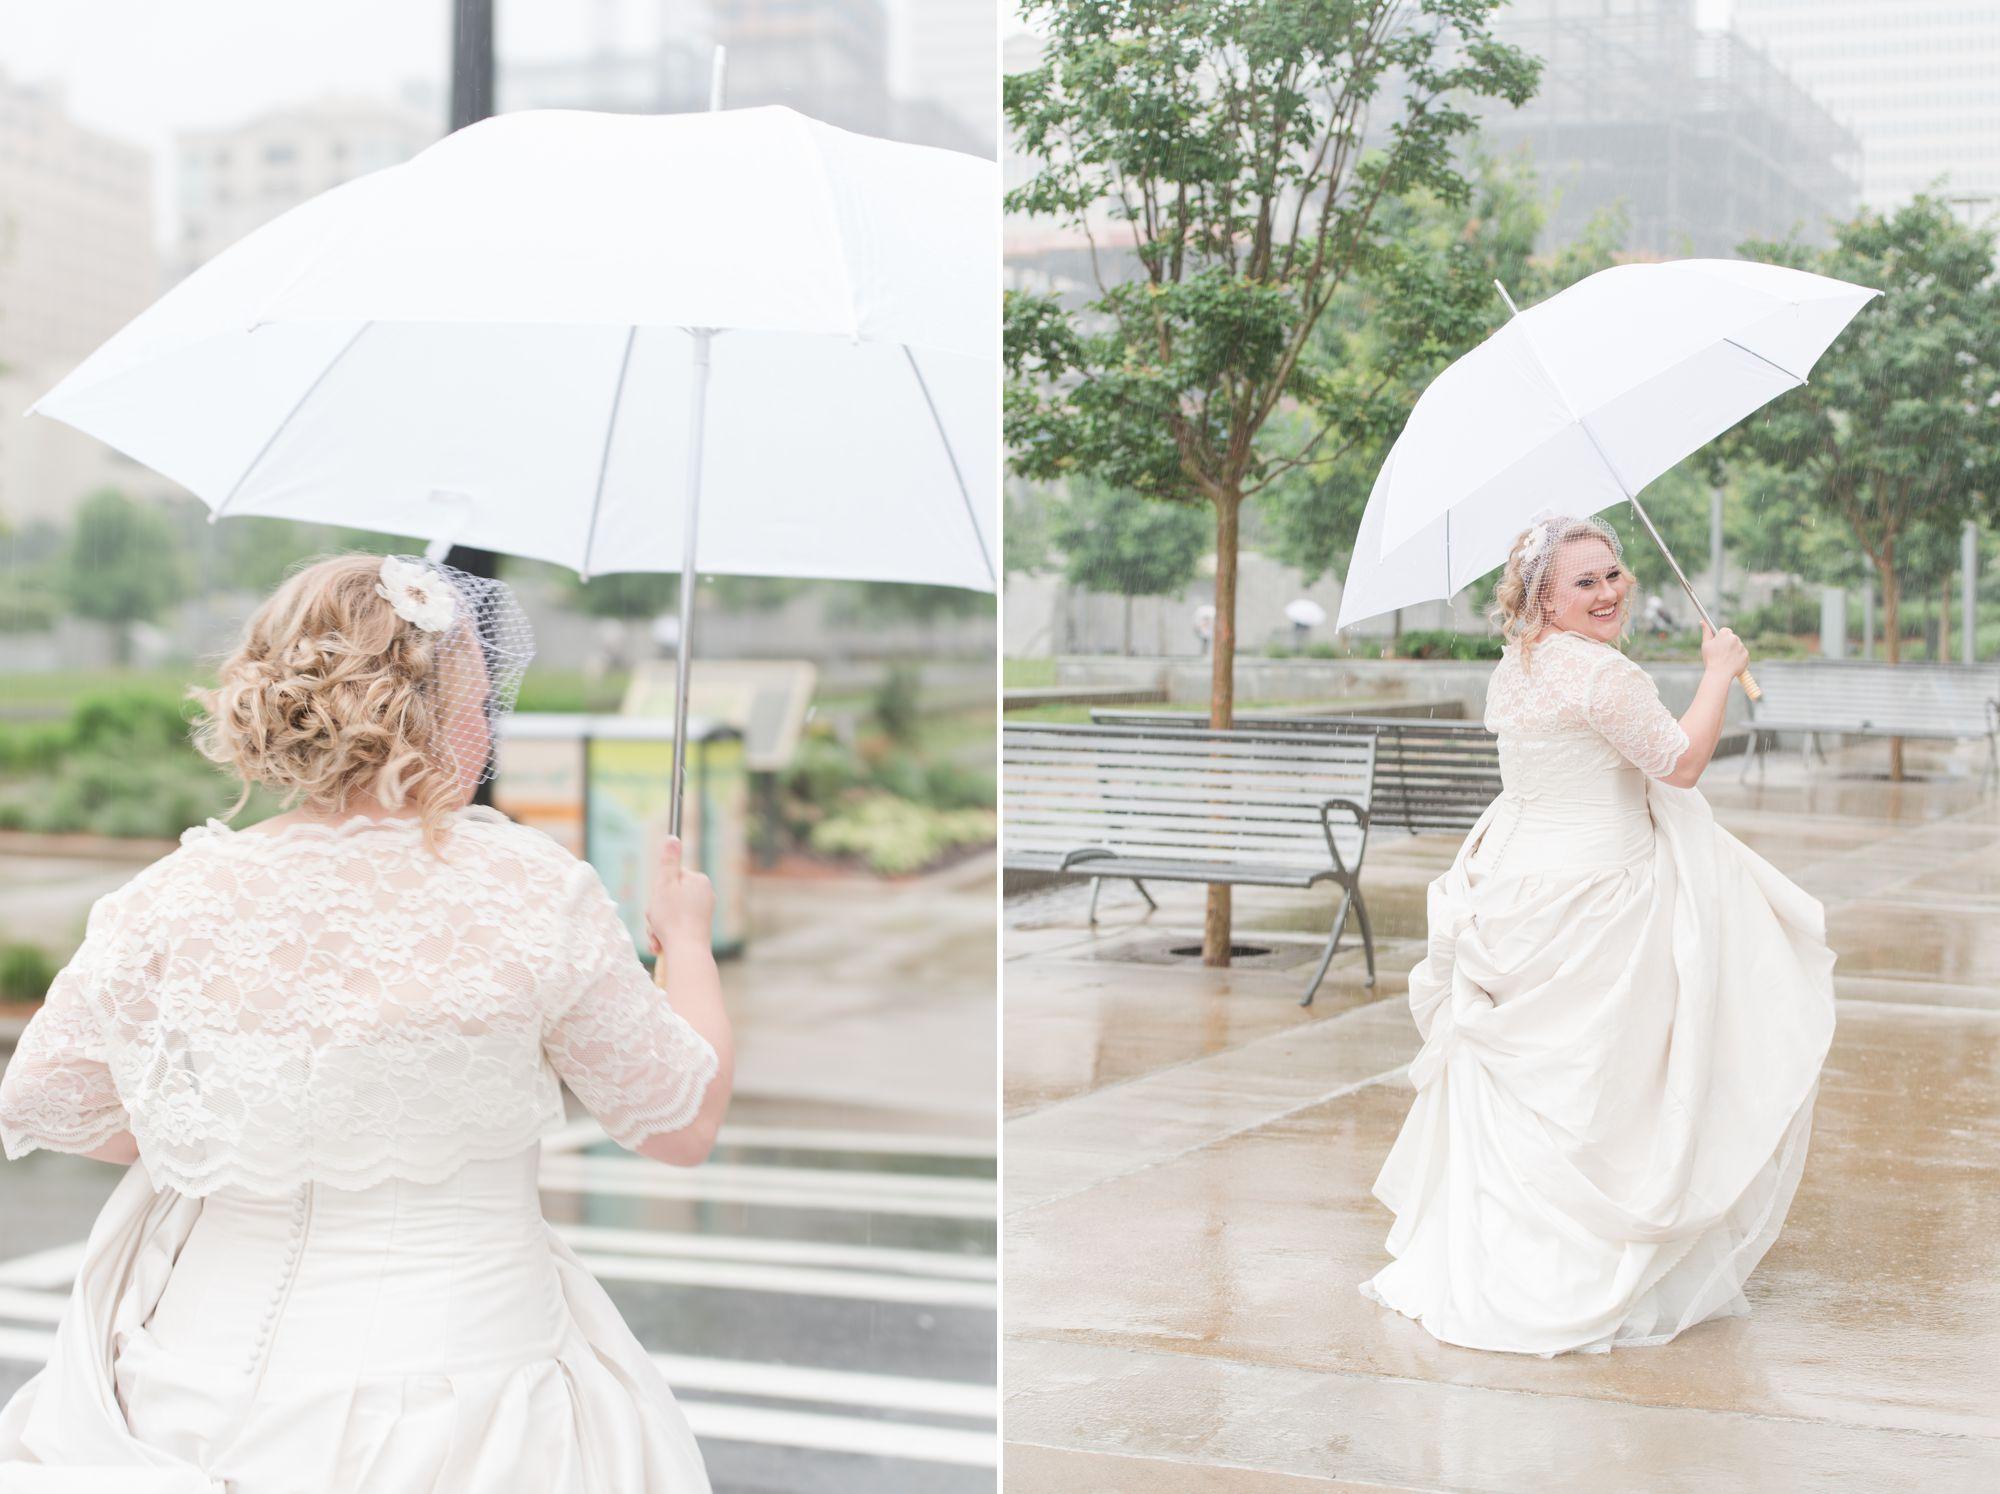 uptown-charlotte-warhouse-wedding 25